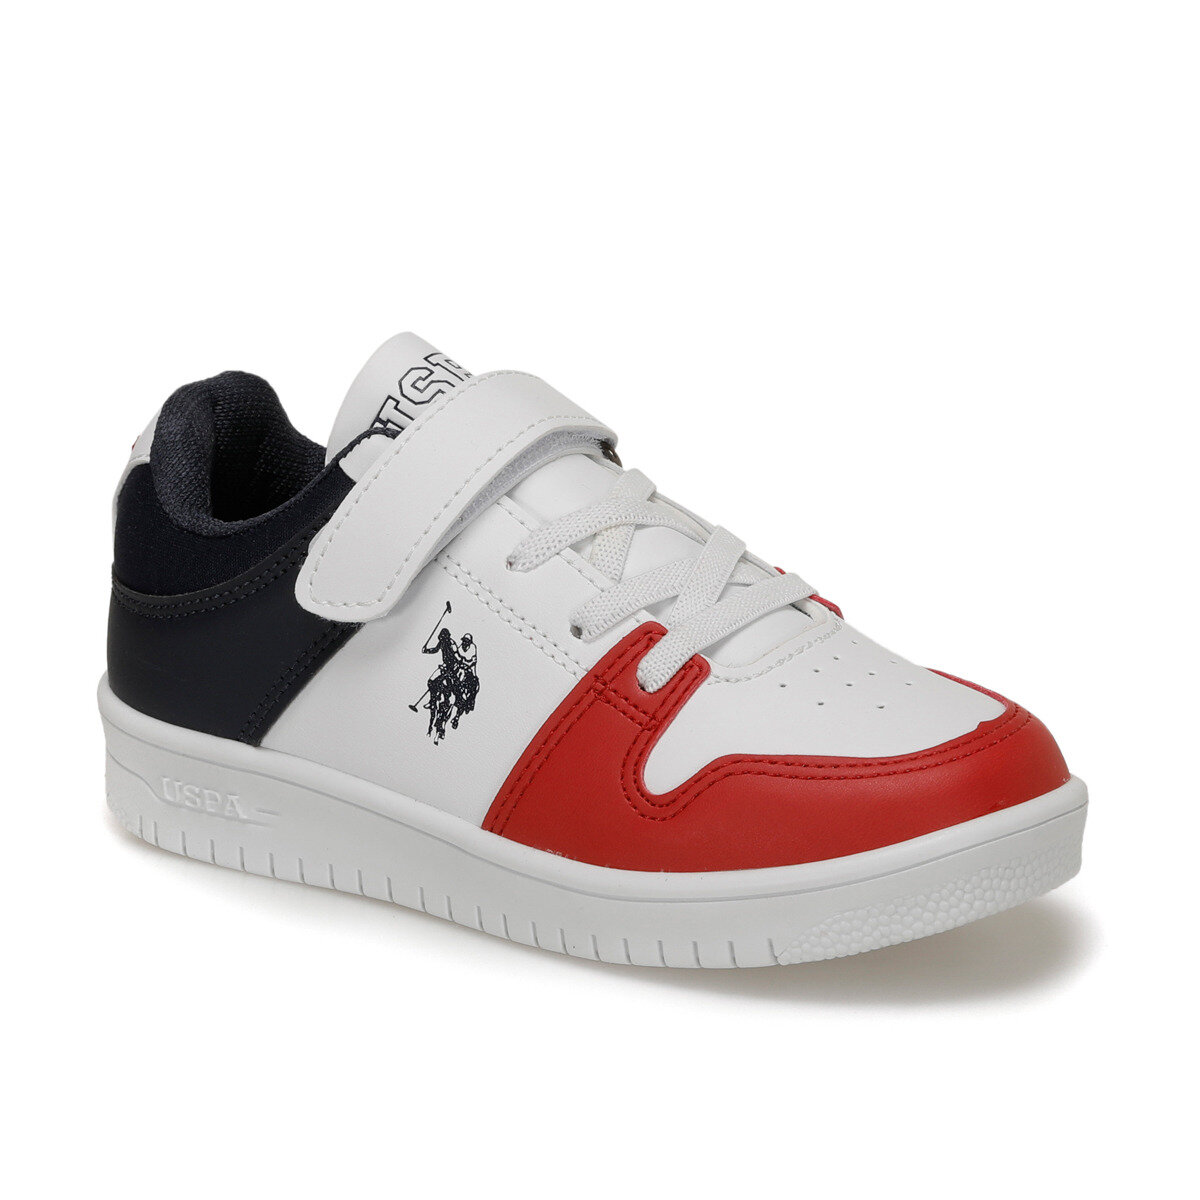 FLO DOUGLAS White Male Child Sneaker Shoes U.S. POLO ASSN.